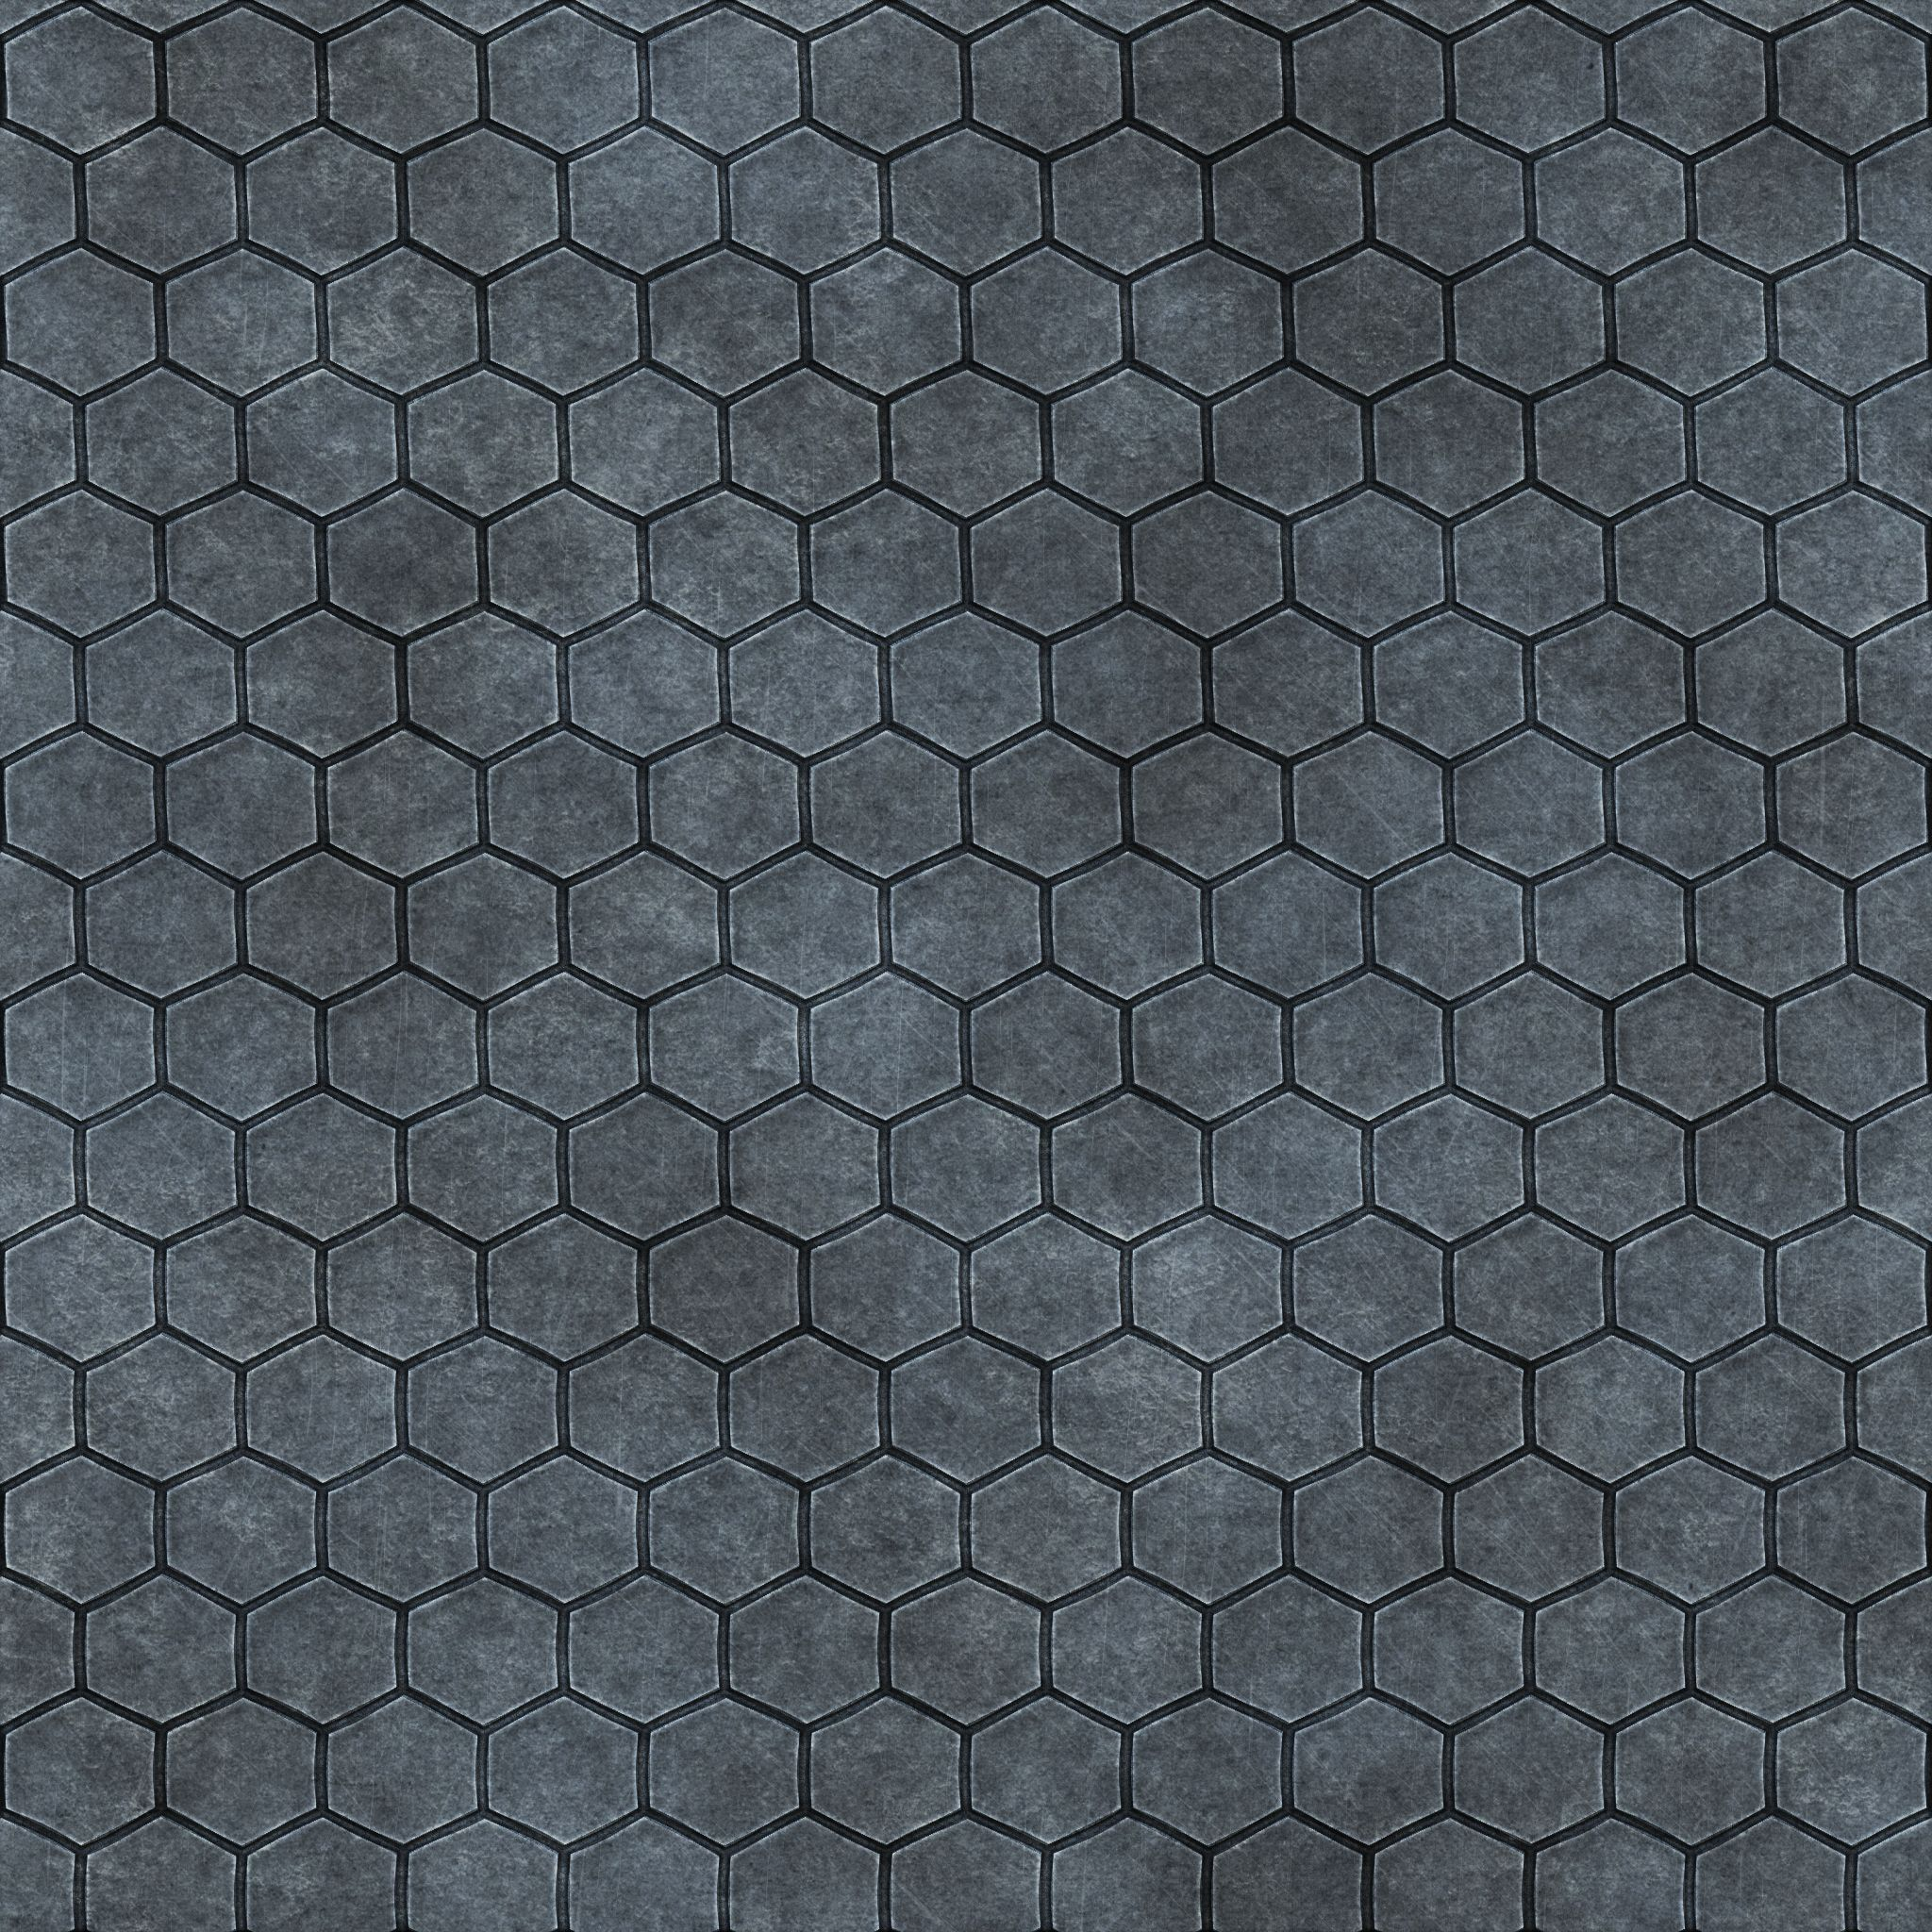 Pin by Reca Mermutluoğlu on Texture Pack | Pinterest | Sci ...